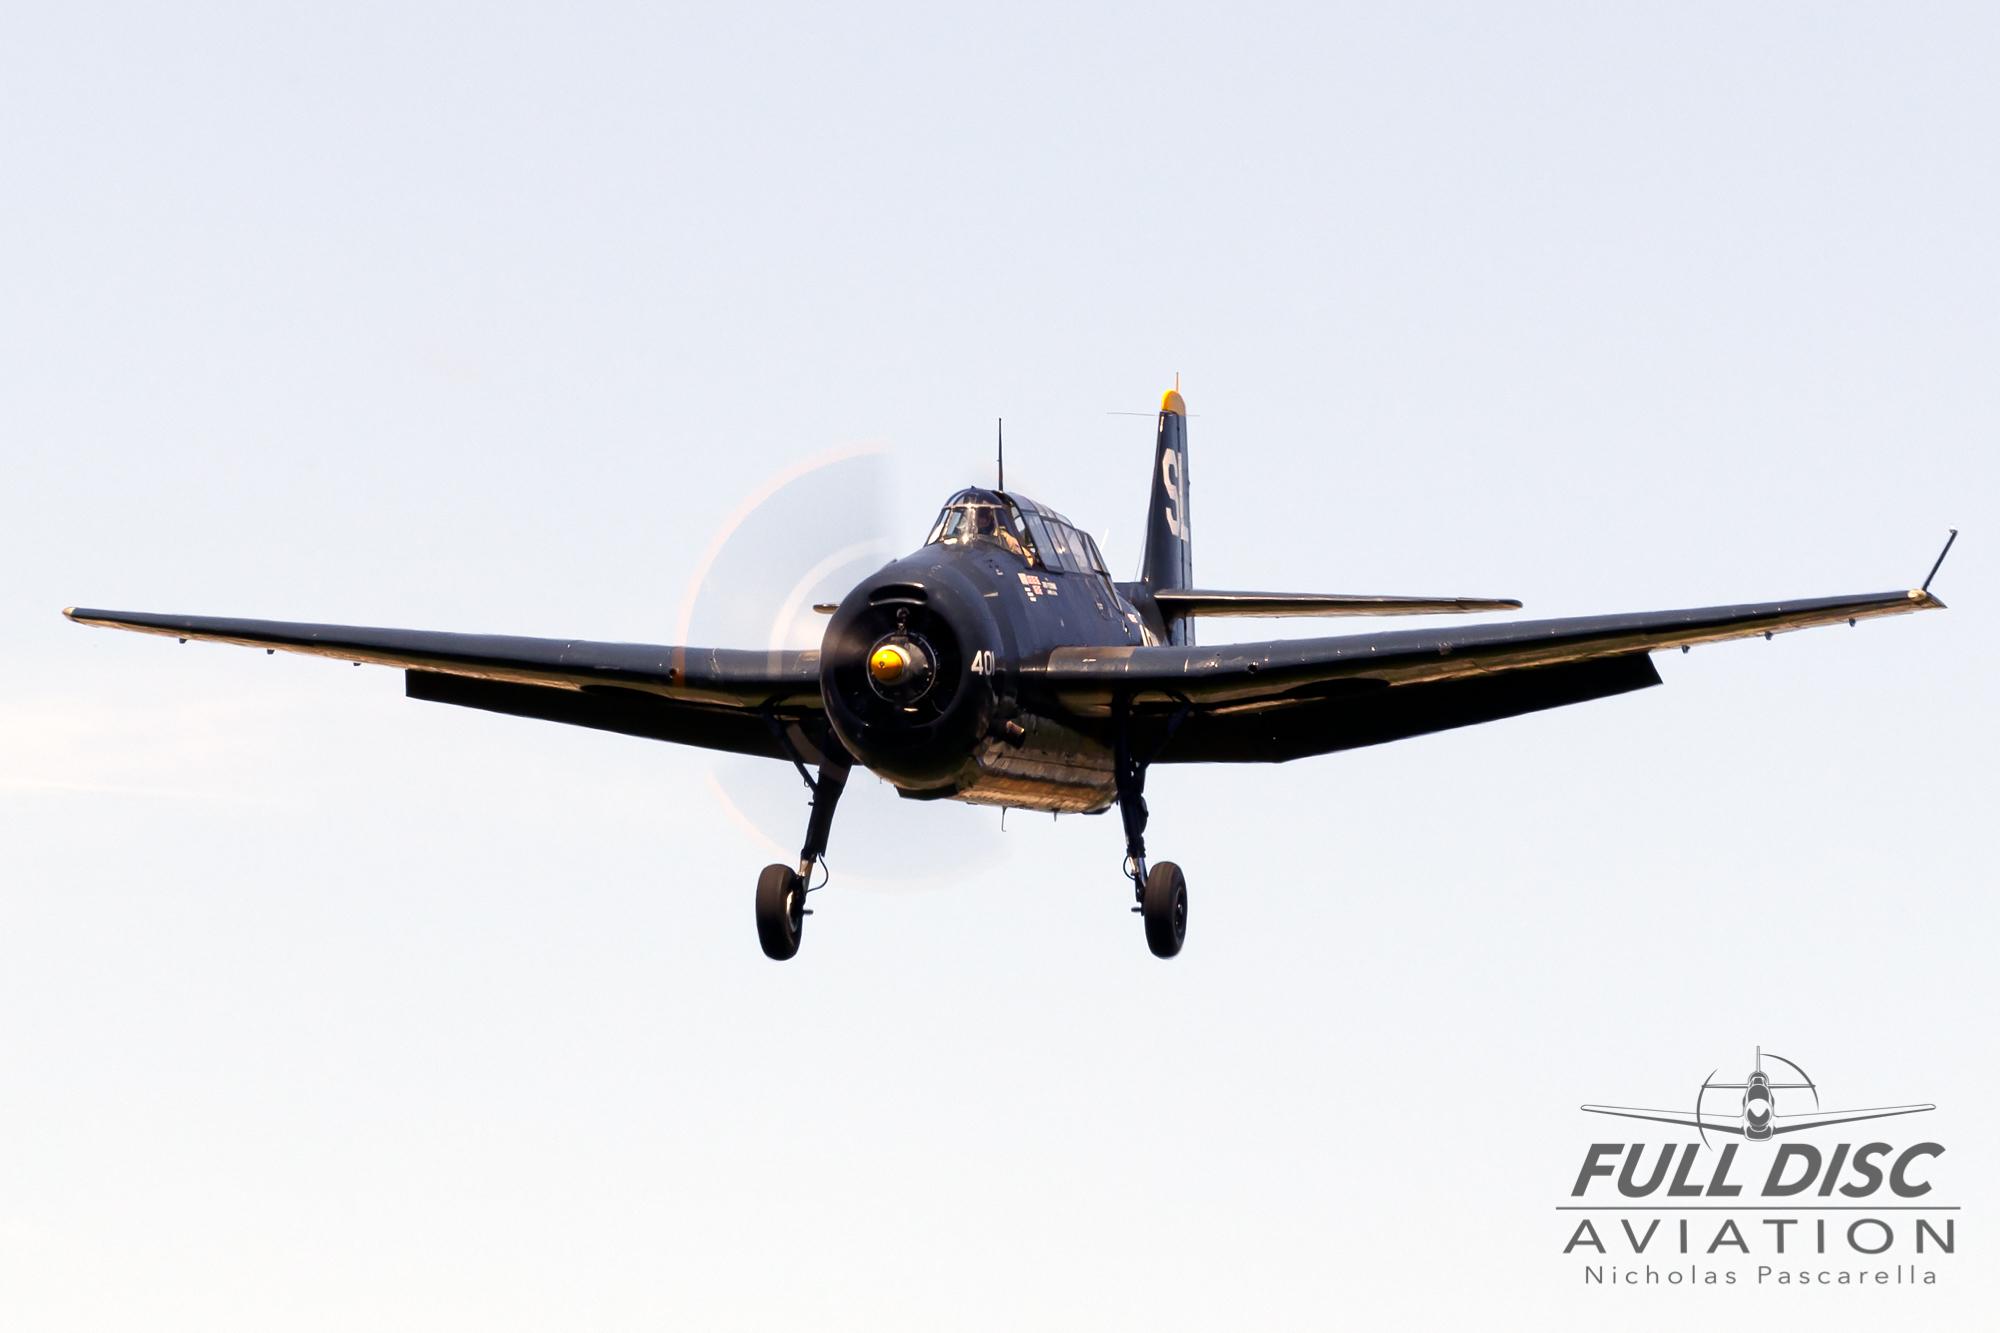 americanairpowermuseum_nicholaspascarella_nickpascarella_fulldiscaviation_legendsofairpower2019_aviation_warbird_tbmavenger_torpedobomber_landing.jpg